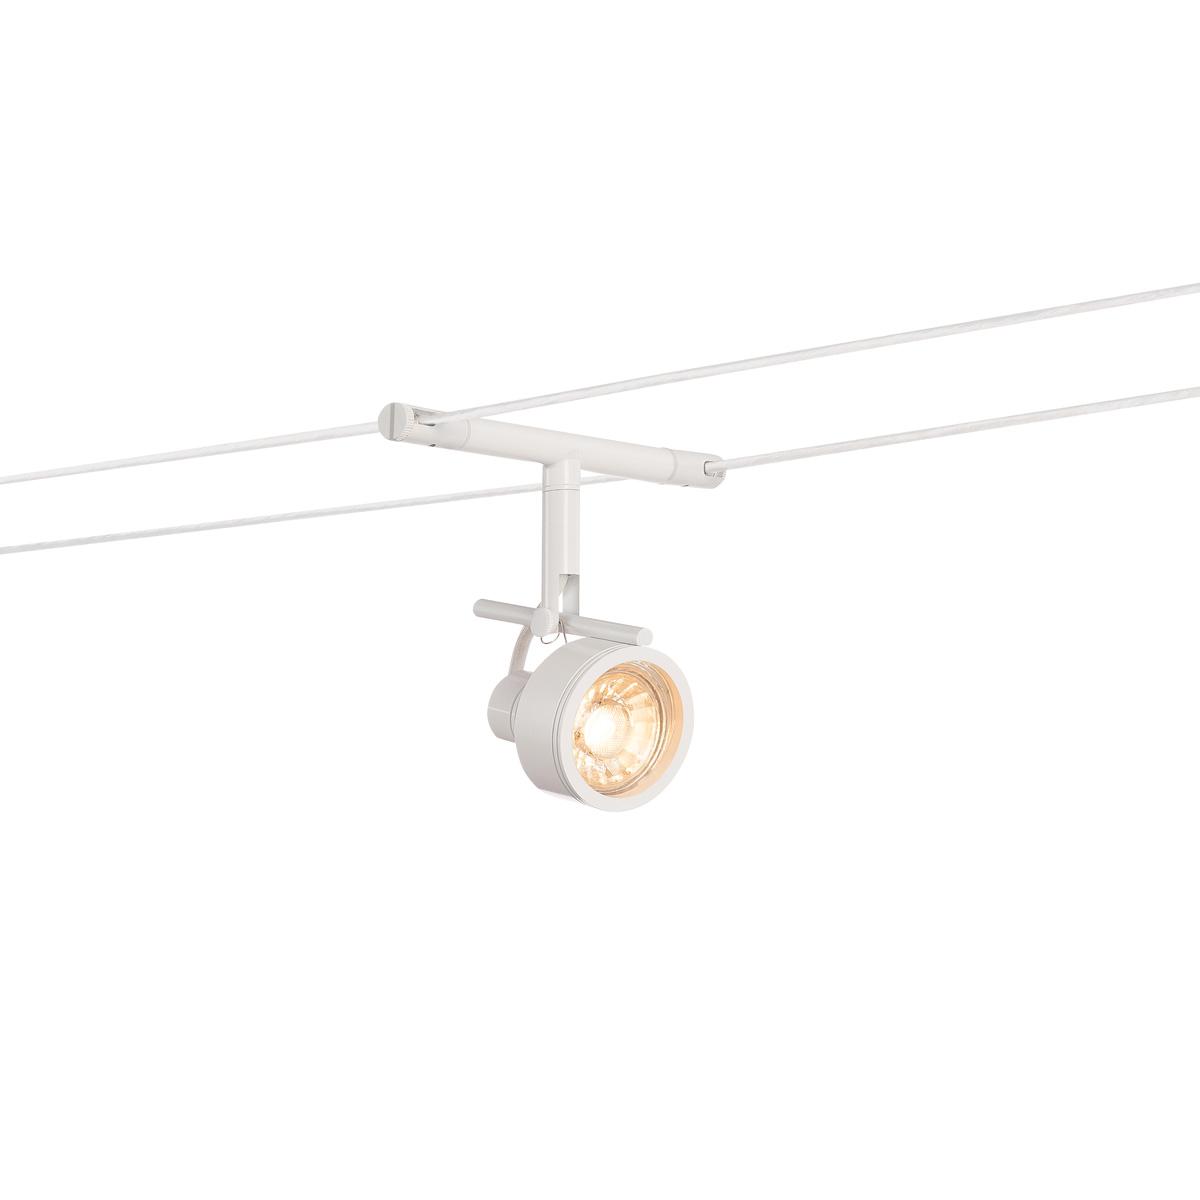 Wire 12v Lighting System Wire 12v Lighting System Lights